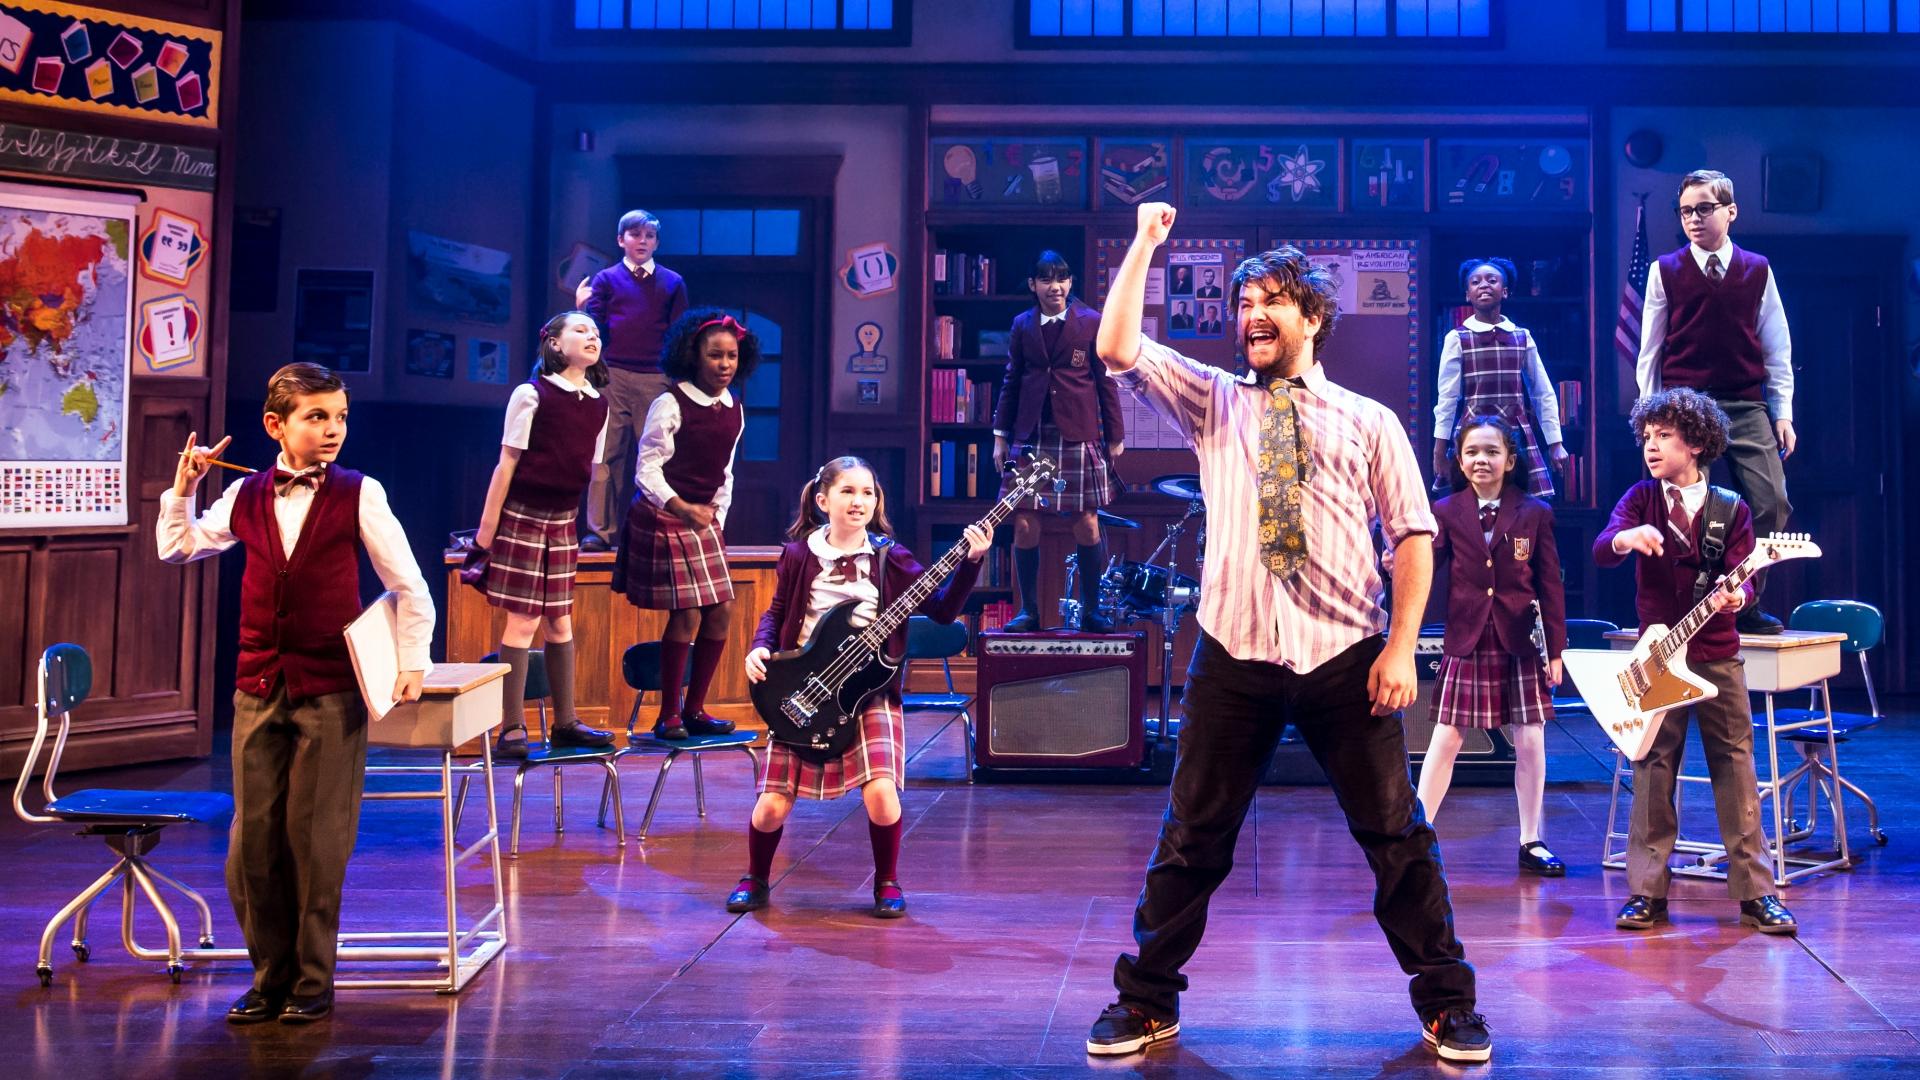 school-of-rock-review-broadway-musical